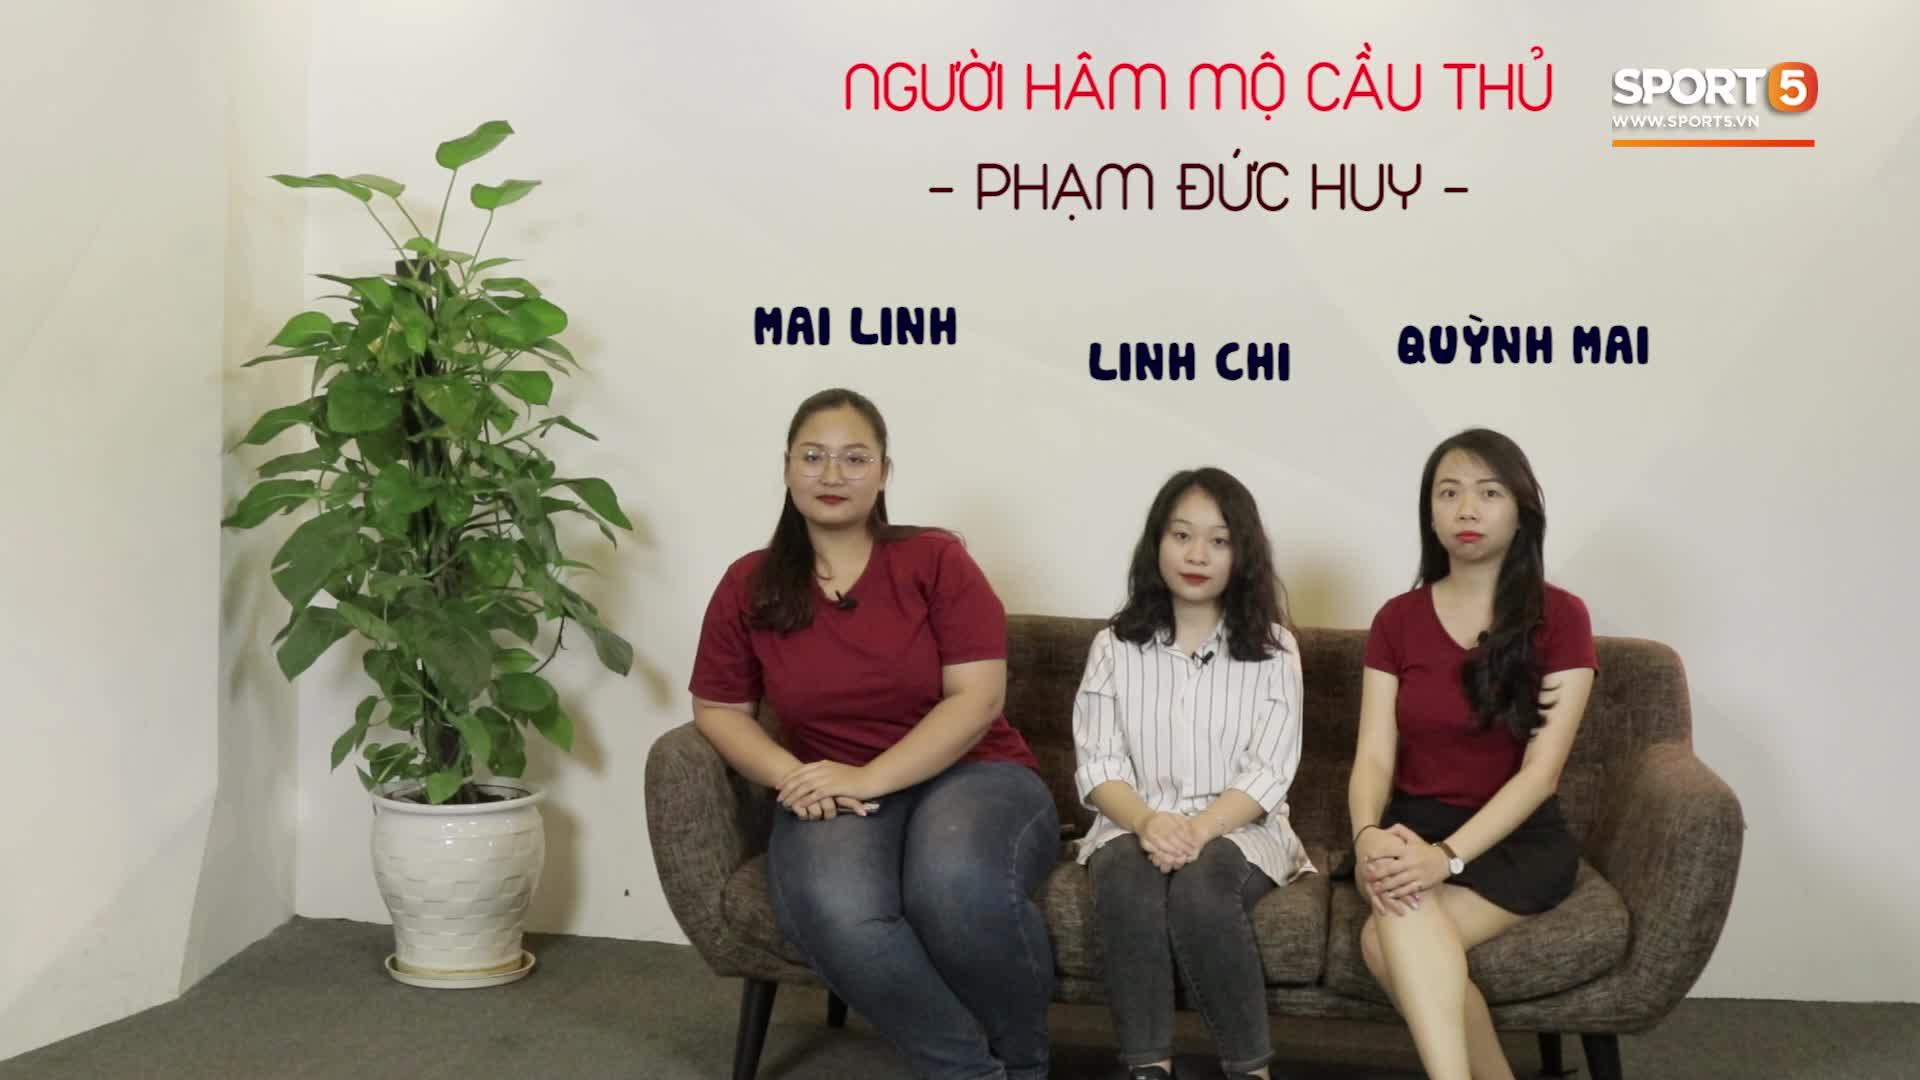 duc-huy-ban-part-2-1555261285960826071597-b8540.jpg